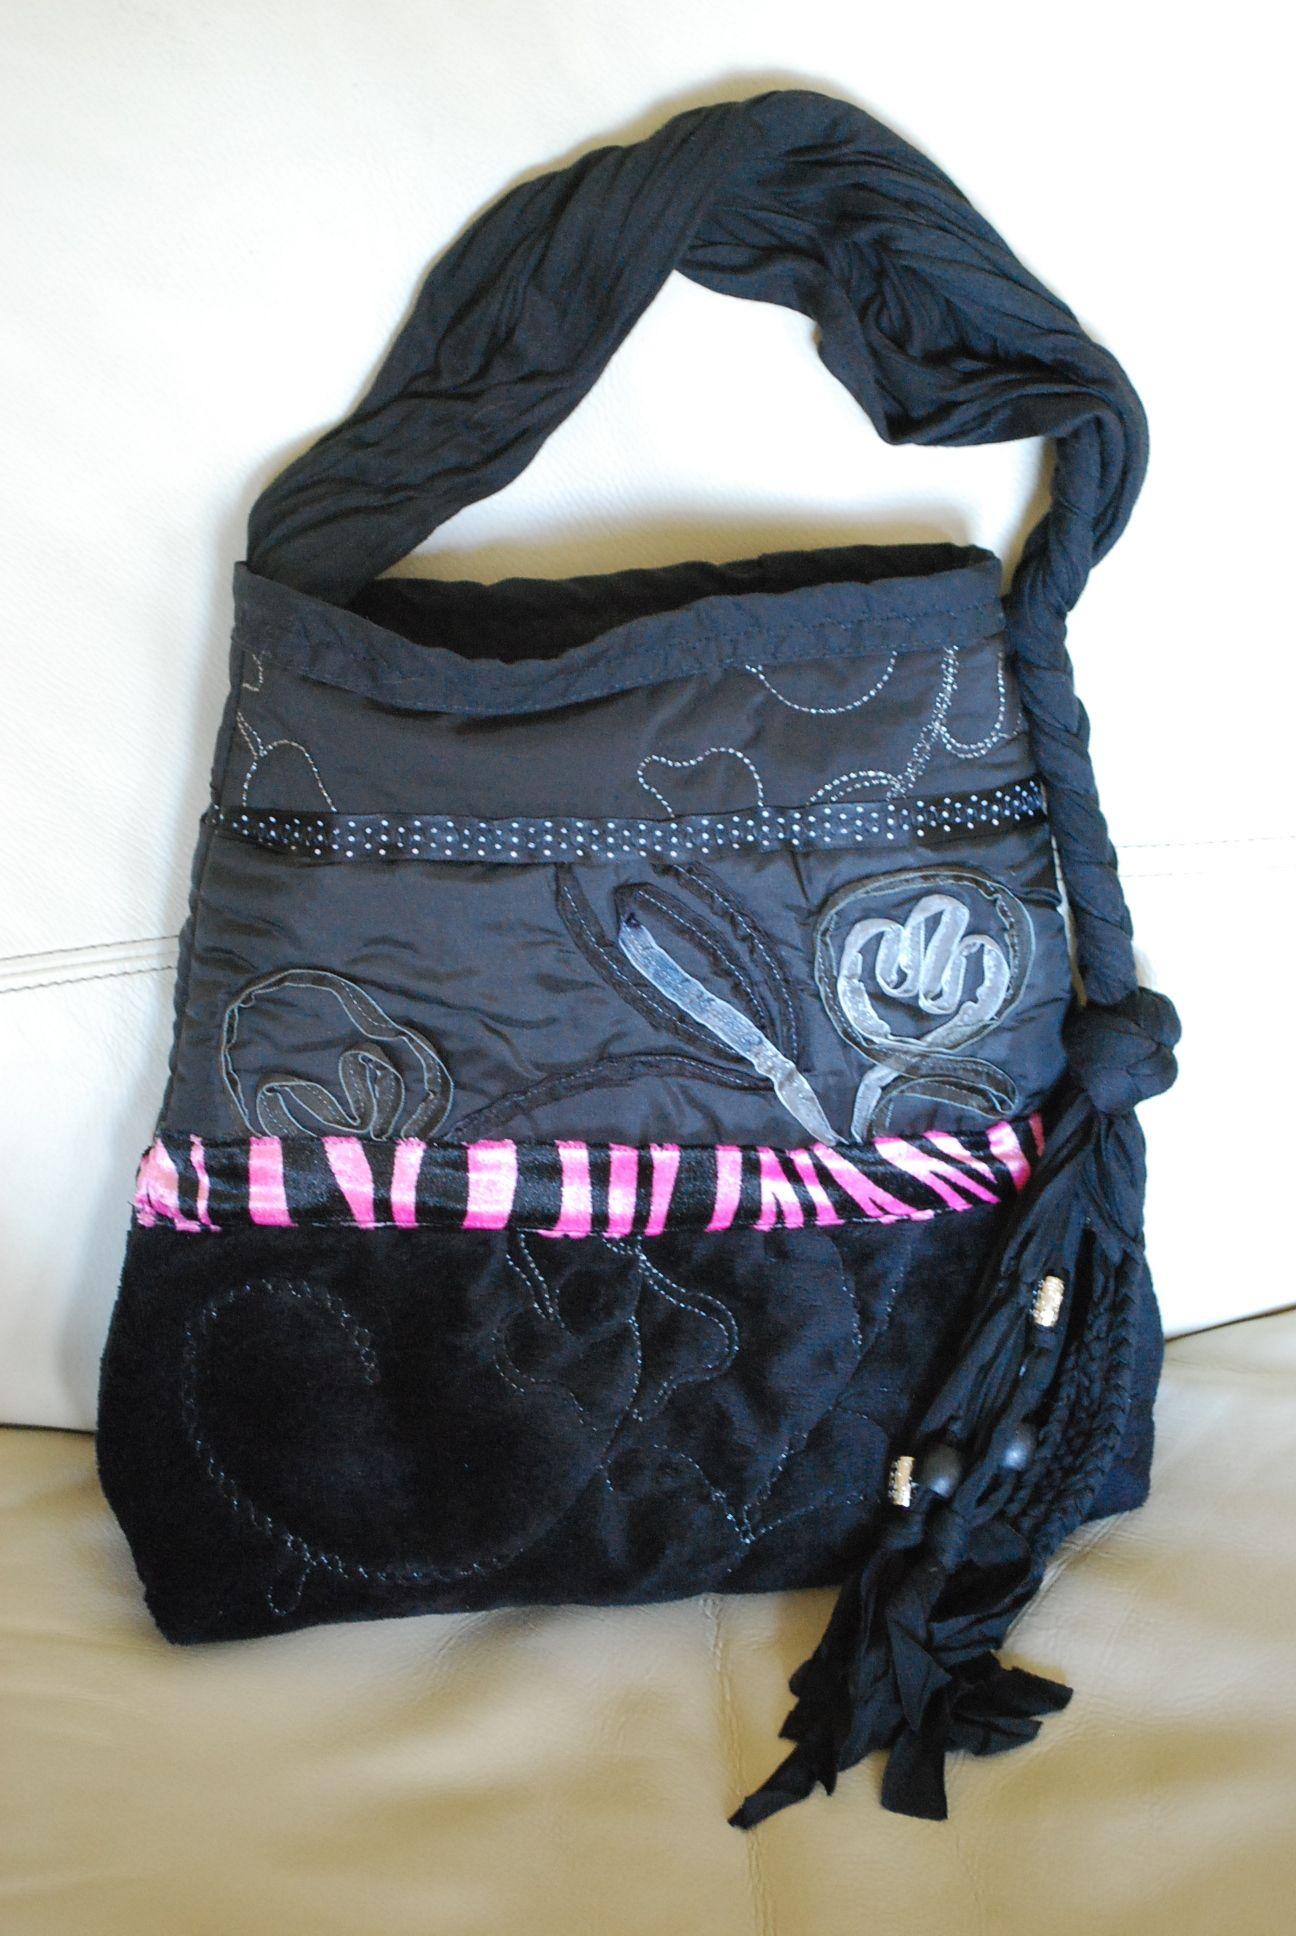 My Home Made Bag Sleepover Party Diy Purse Handmade Bags